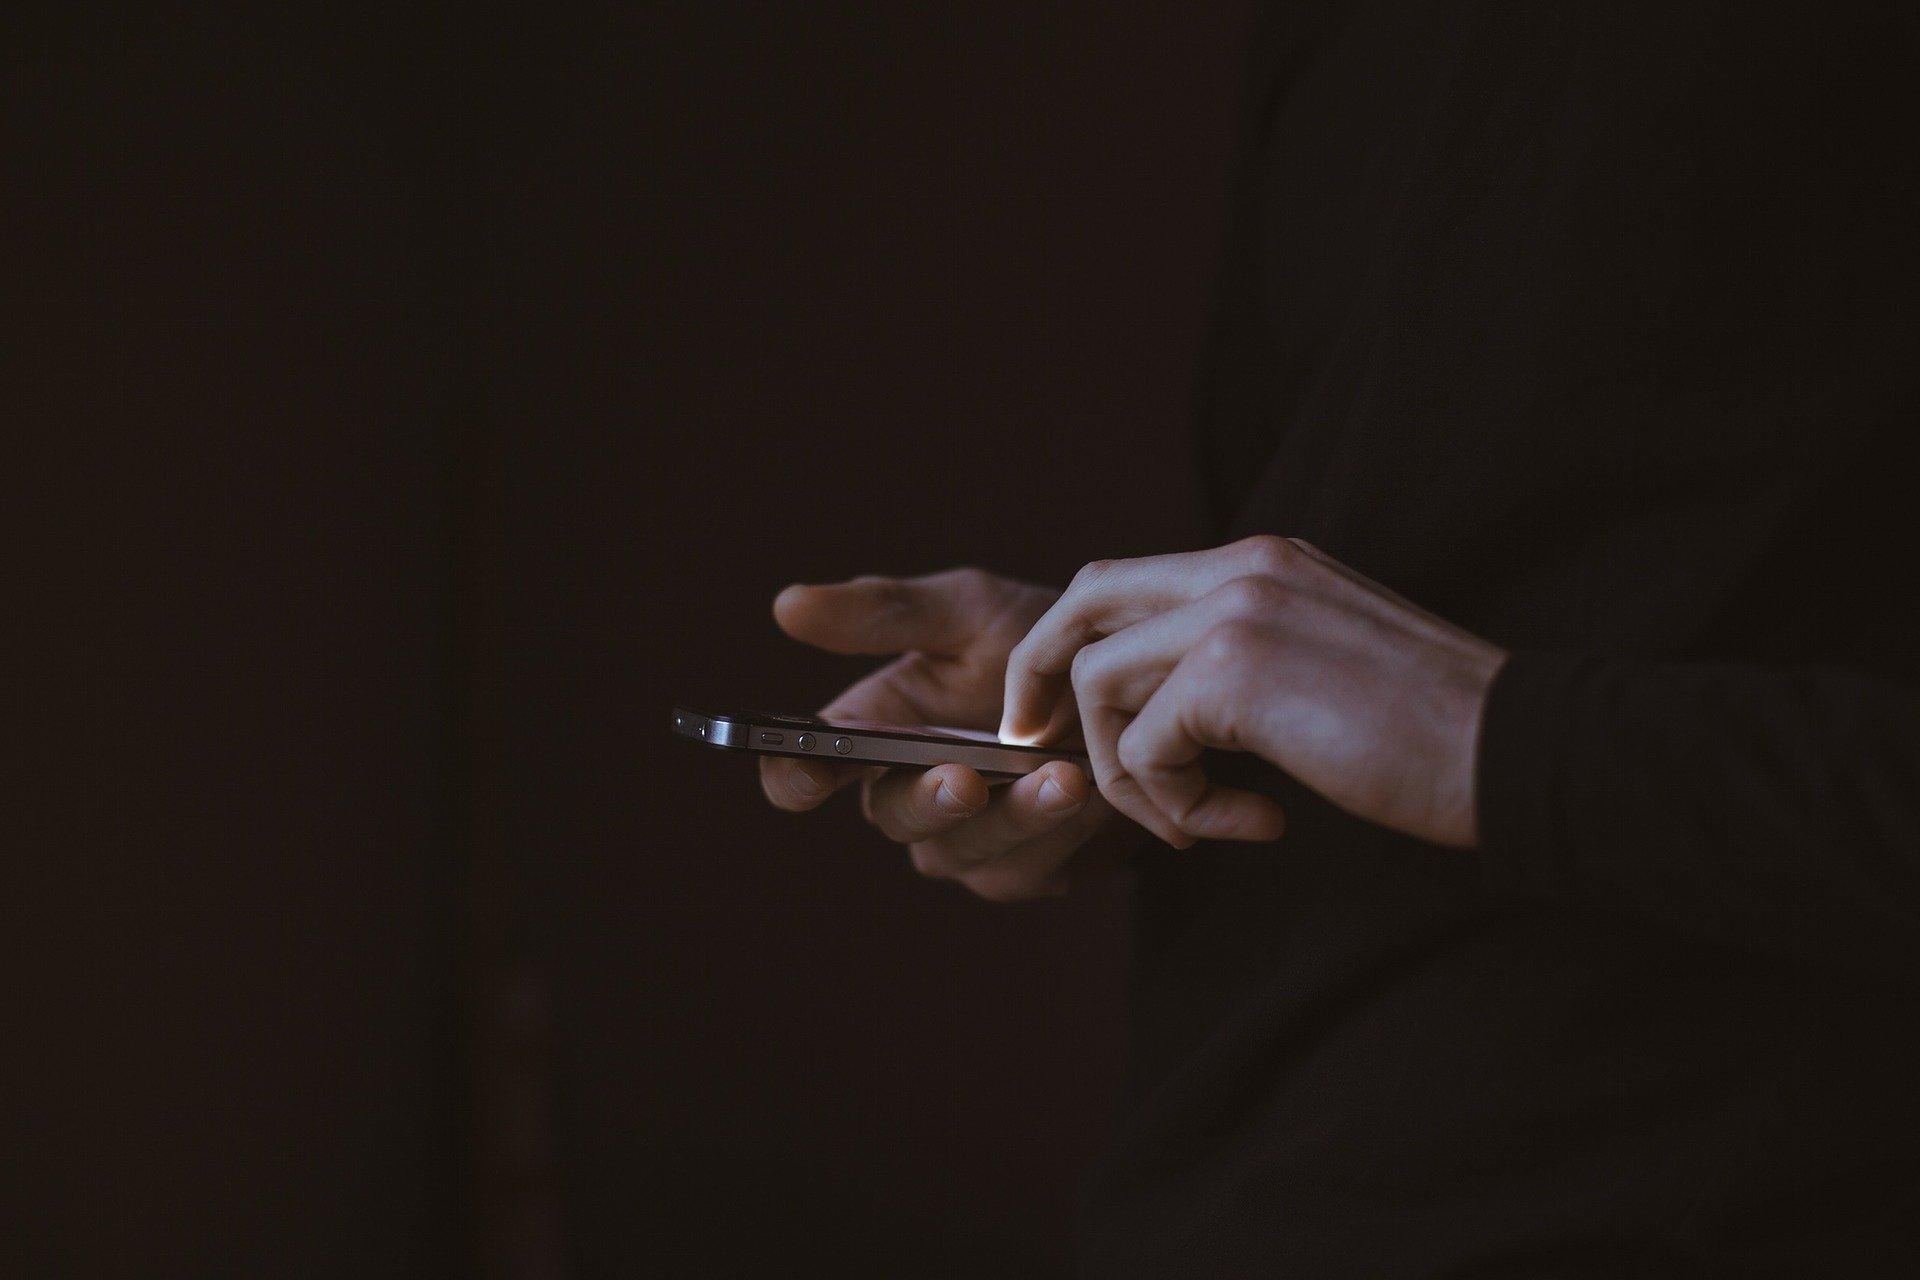 cell phone black backgroun